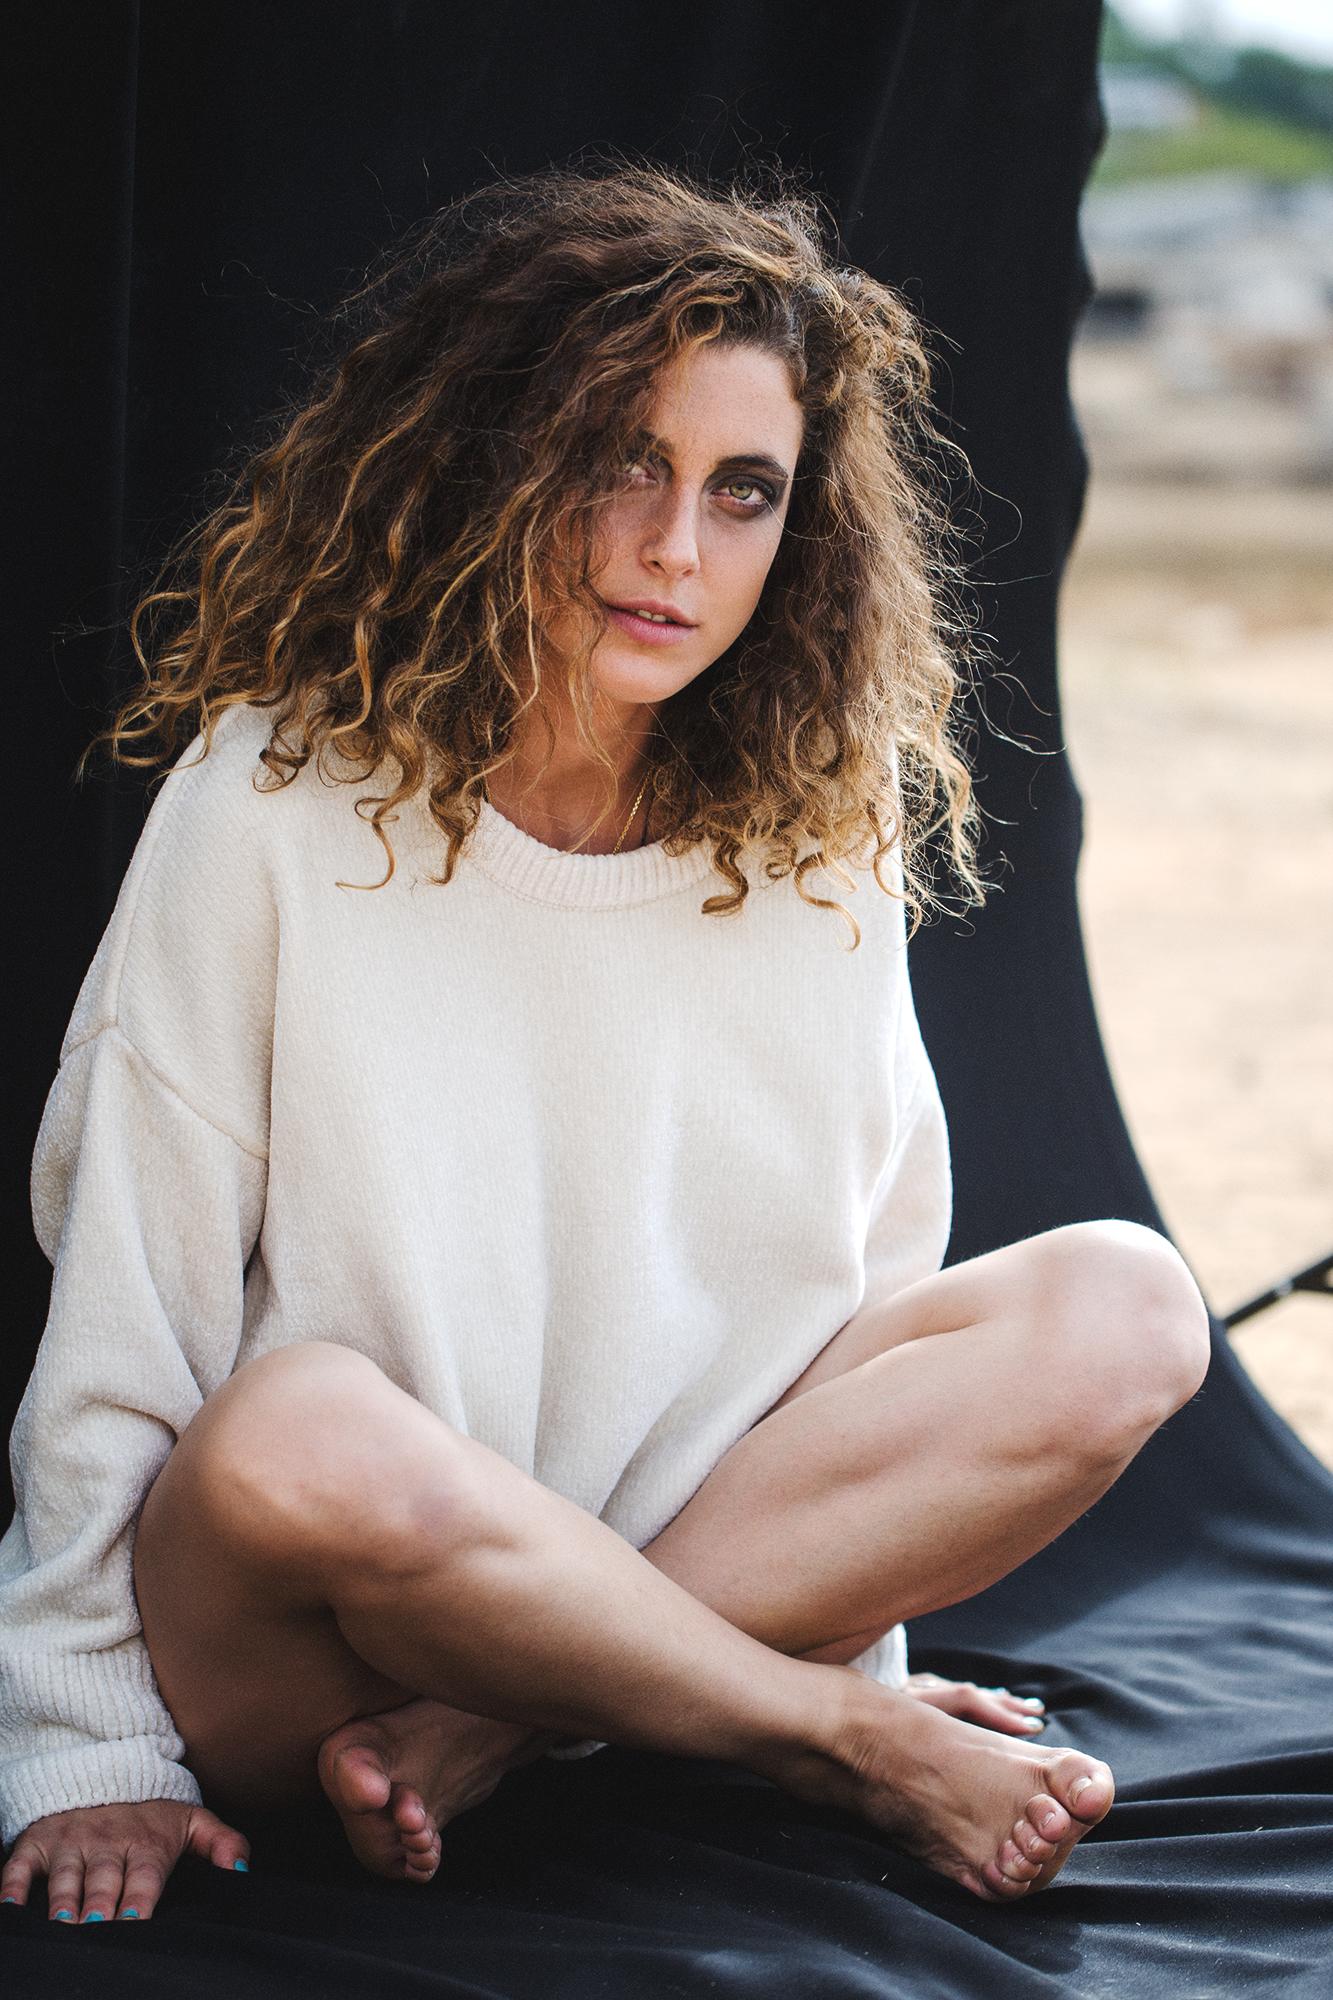 Paula Hidalgo